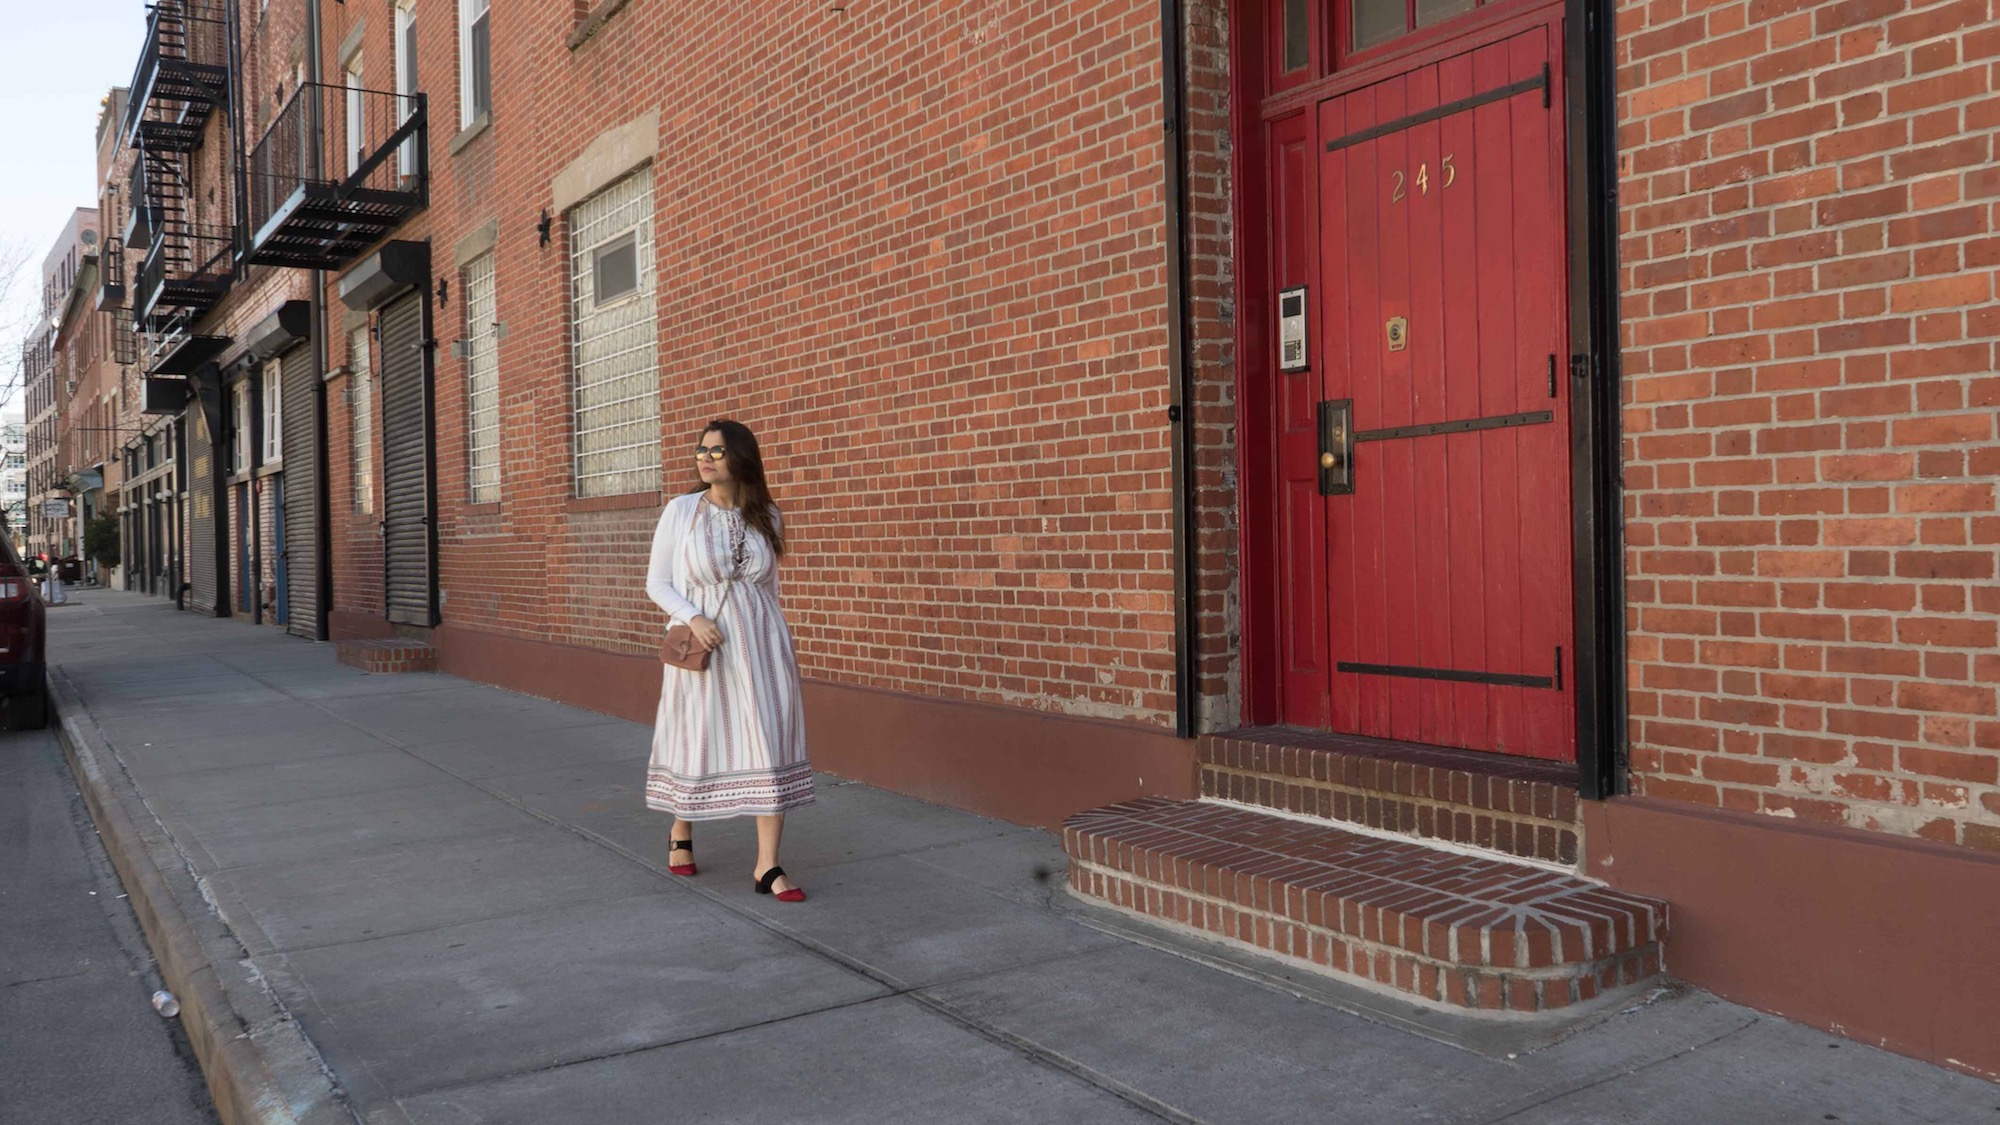 alley-girl-new-york-fashion-blogger-betul-yildiz-street-style-3